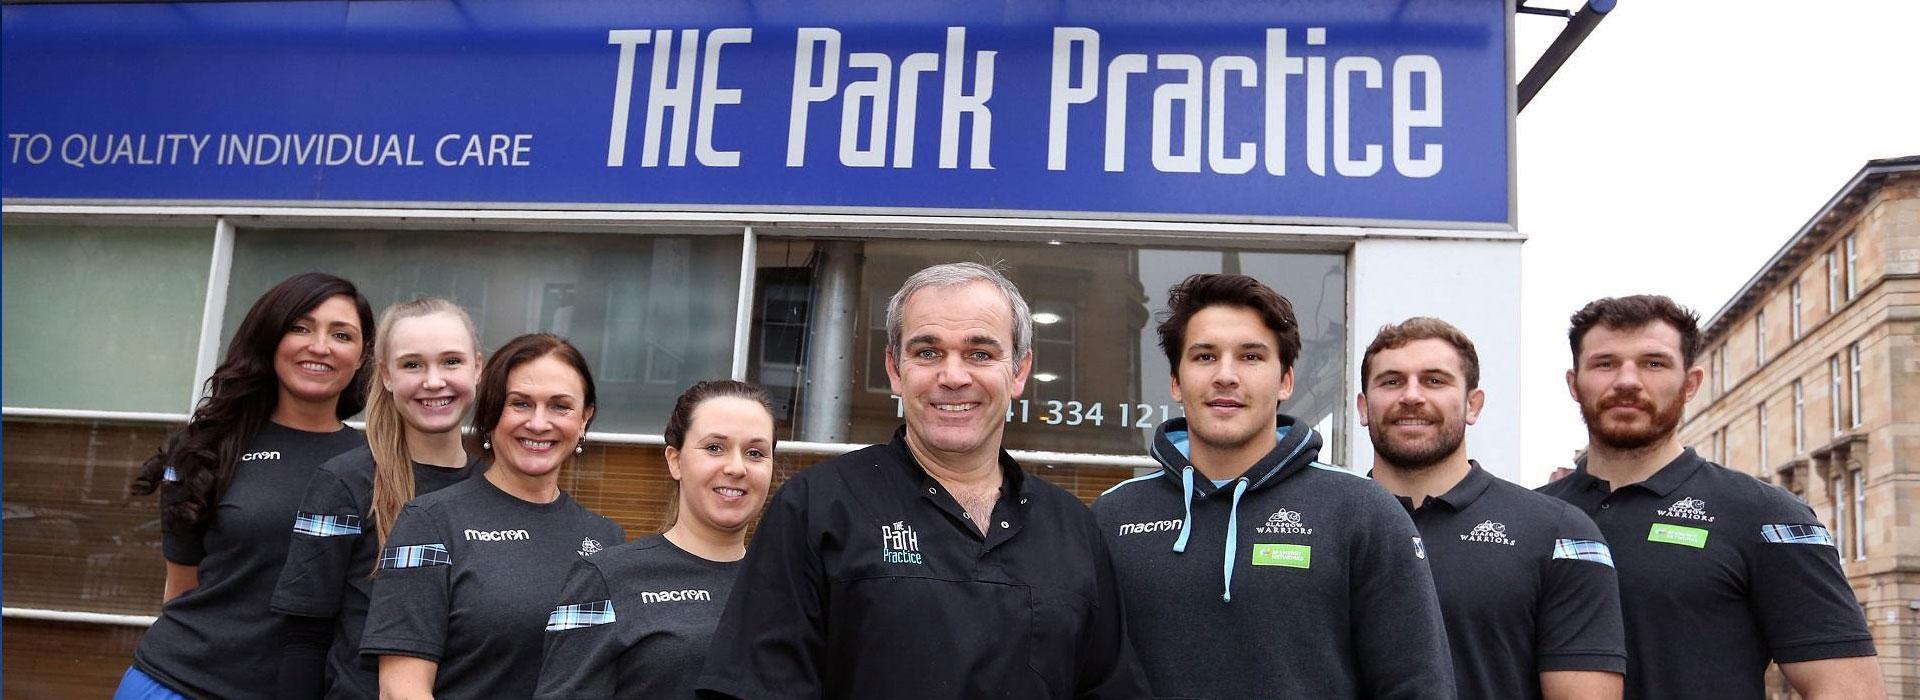 Glasgow dental practice - UK family dentist in Glasgow